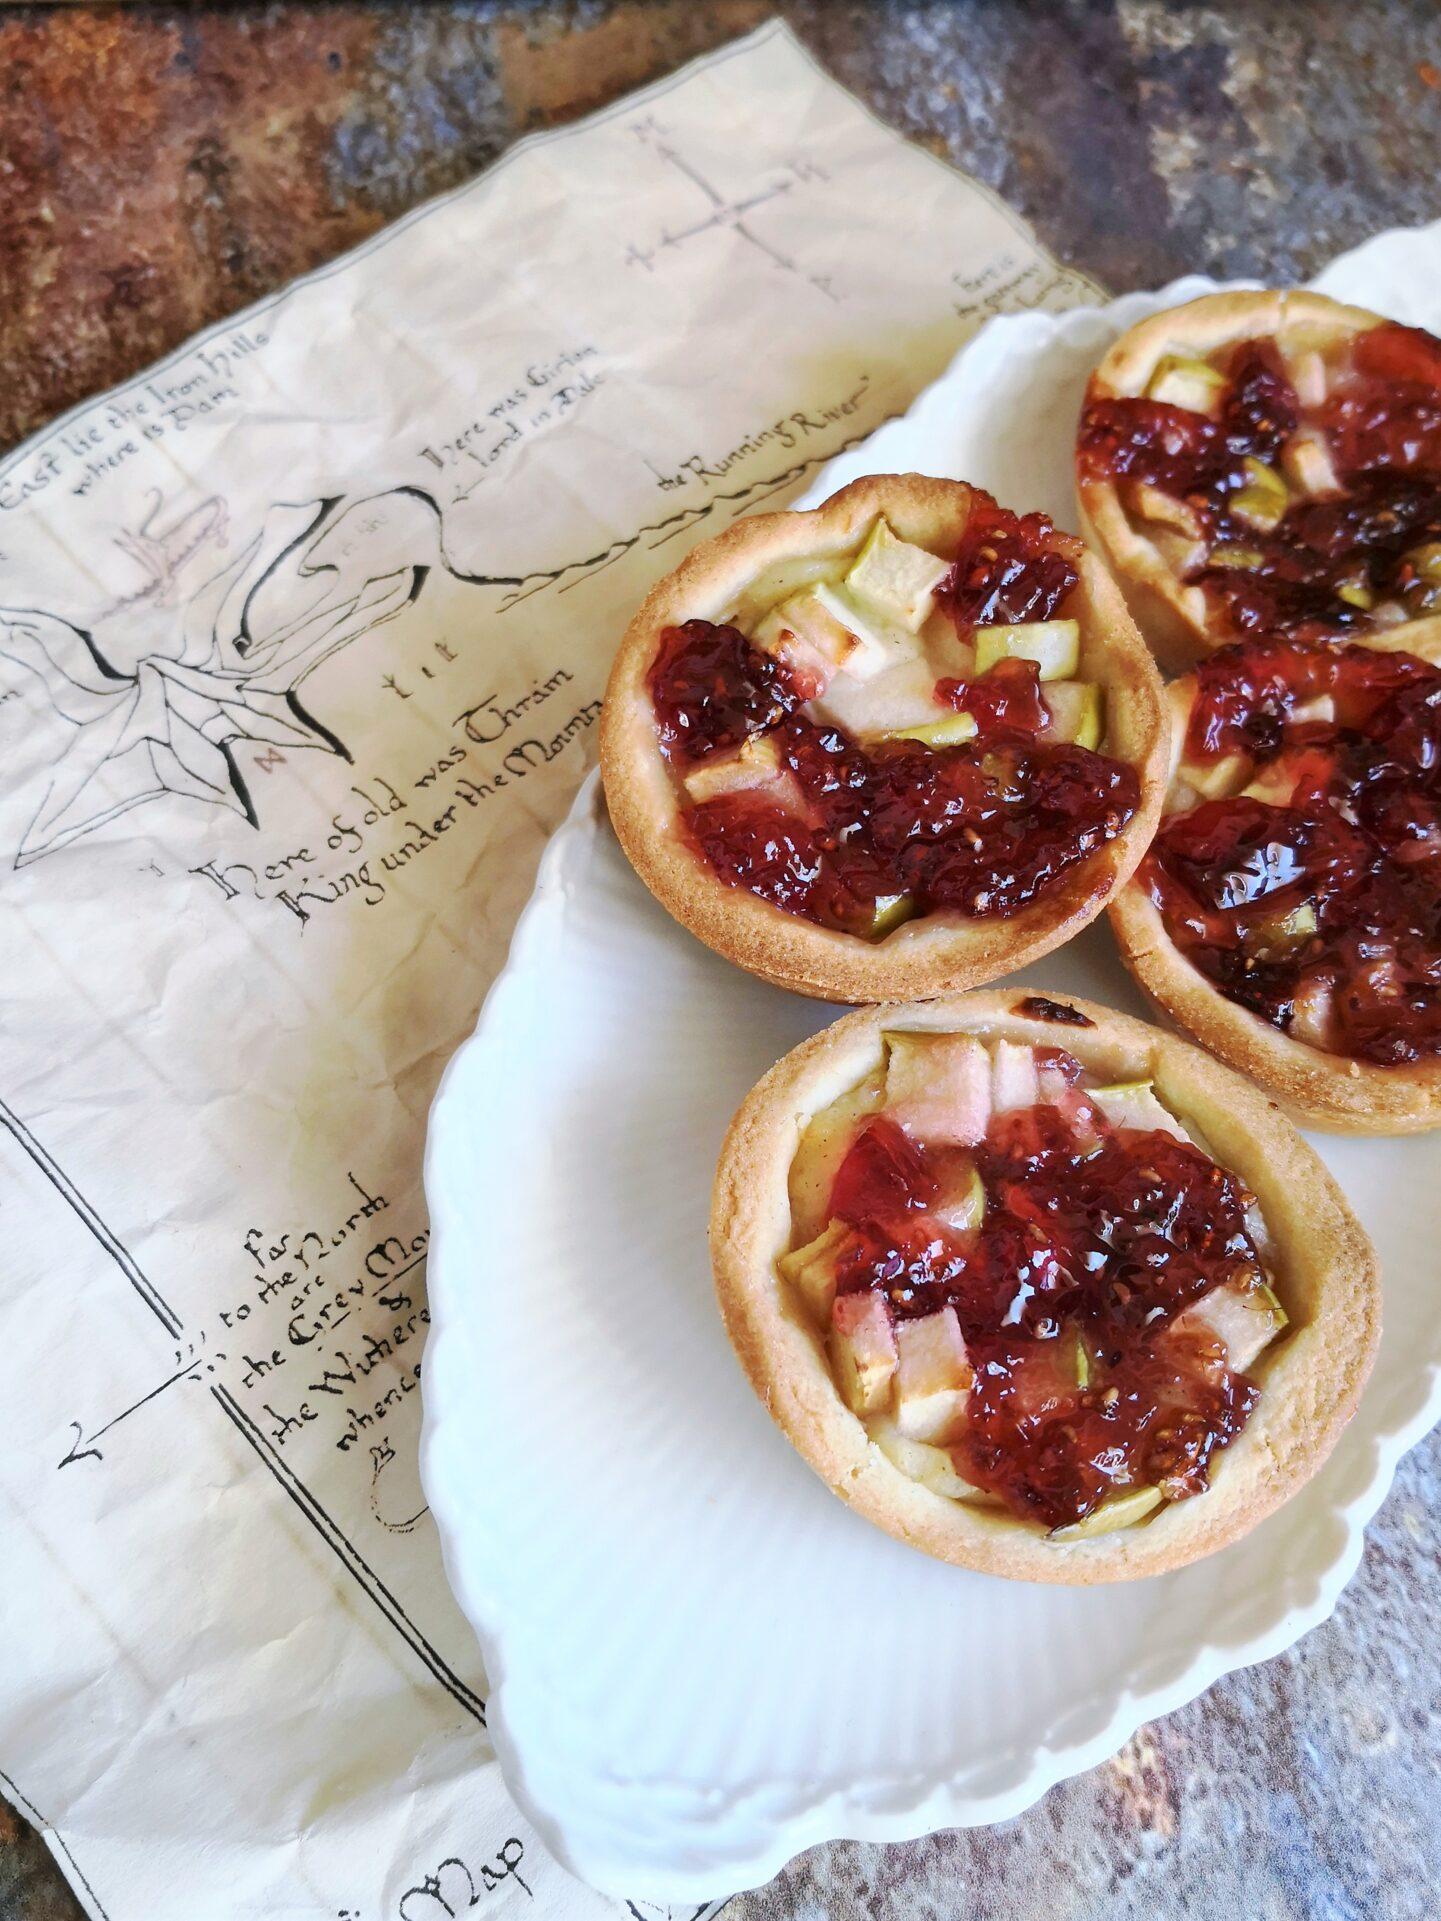 Bifurs æbletærte med hindbær